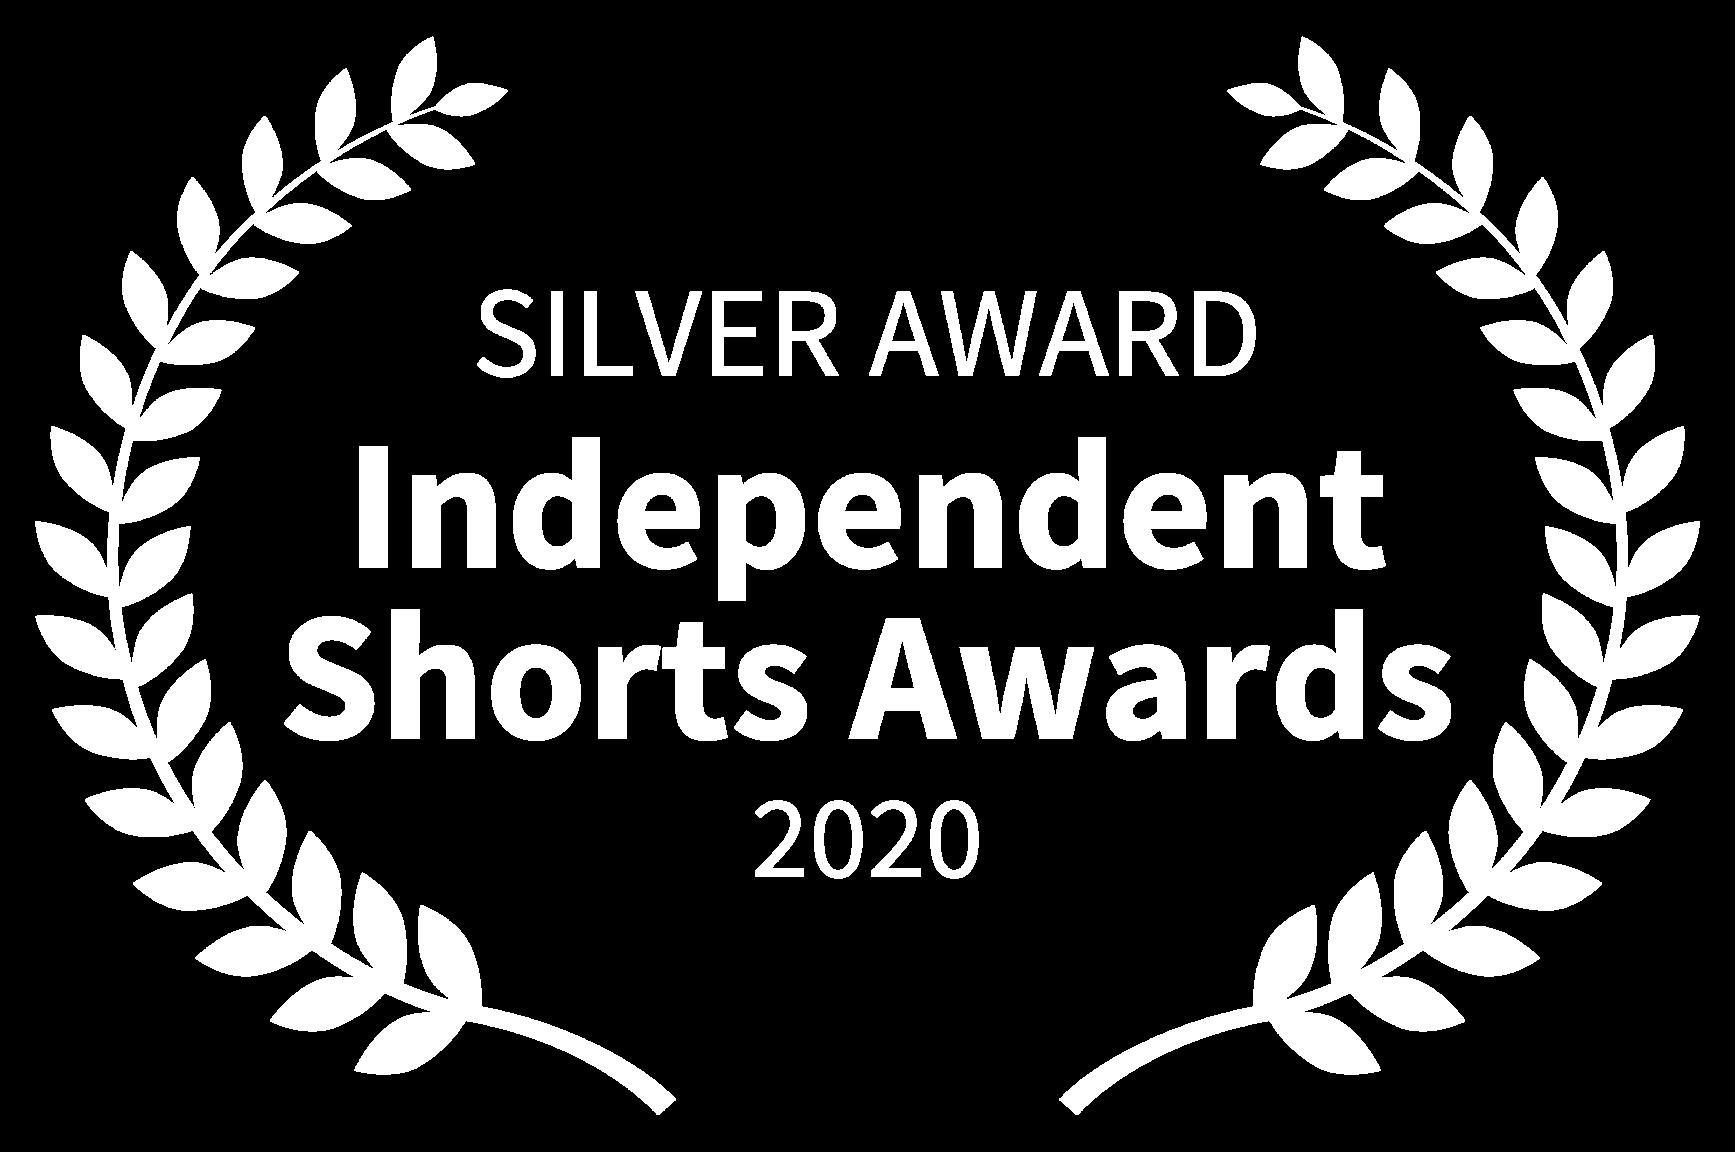 SILVER AWARD - Independent Shorts Awards - 2020